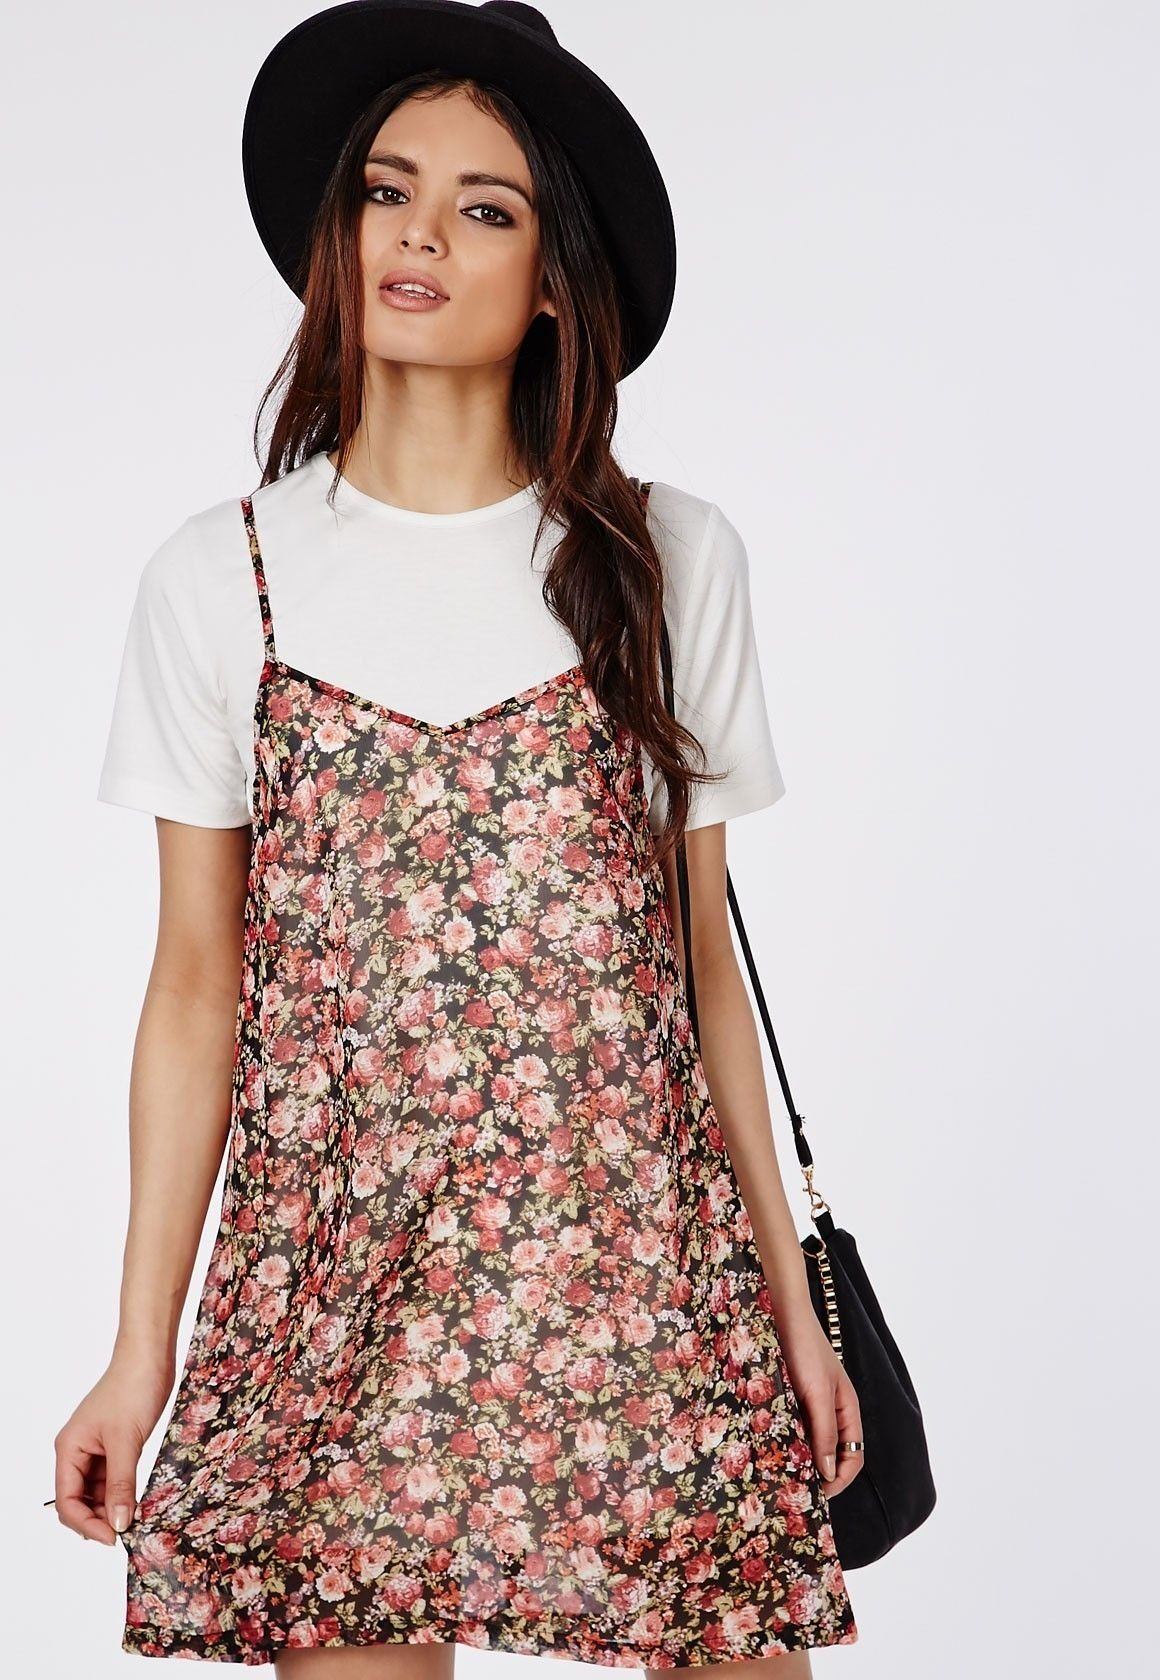 Rosie(On Hold)  Shirt under dress, Slip dress outfit, T shirt